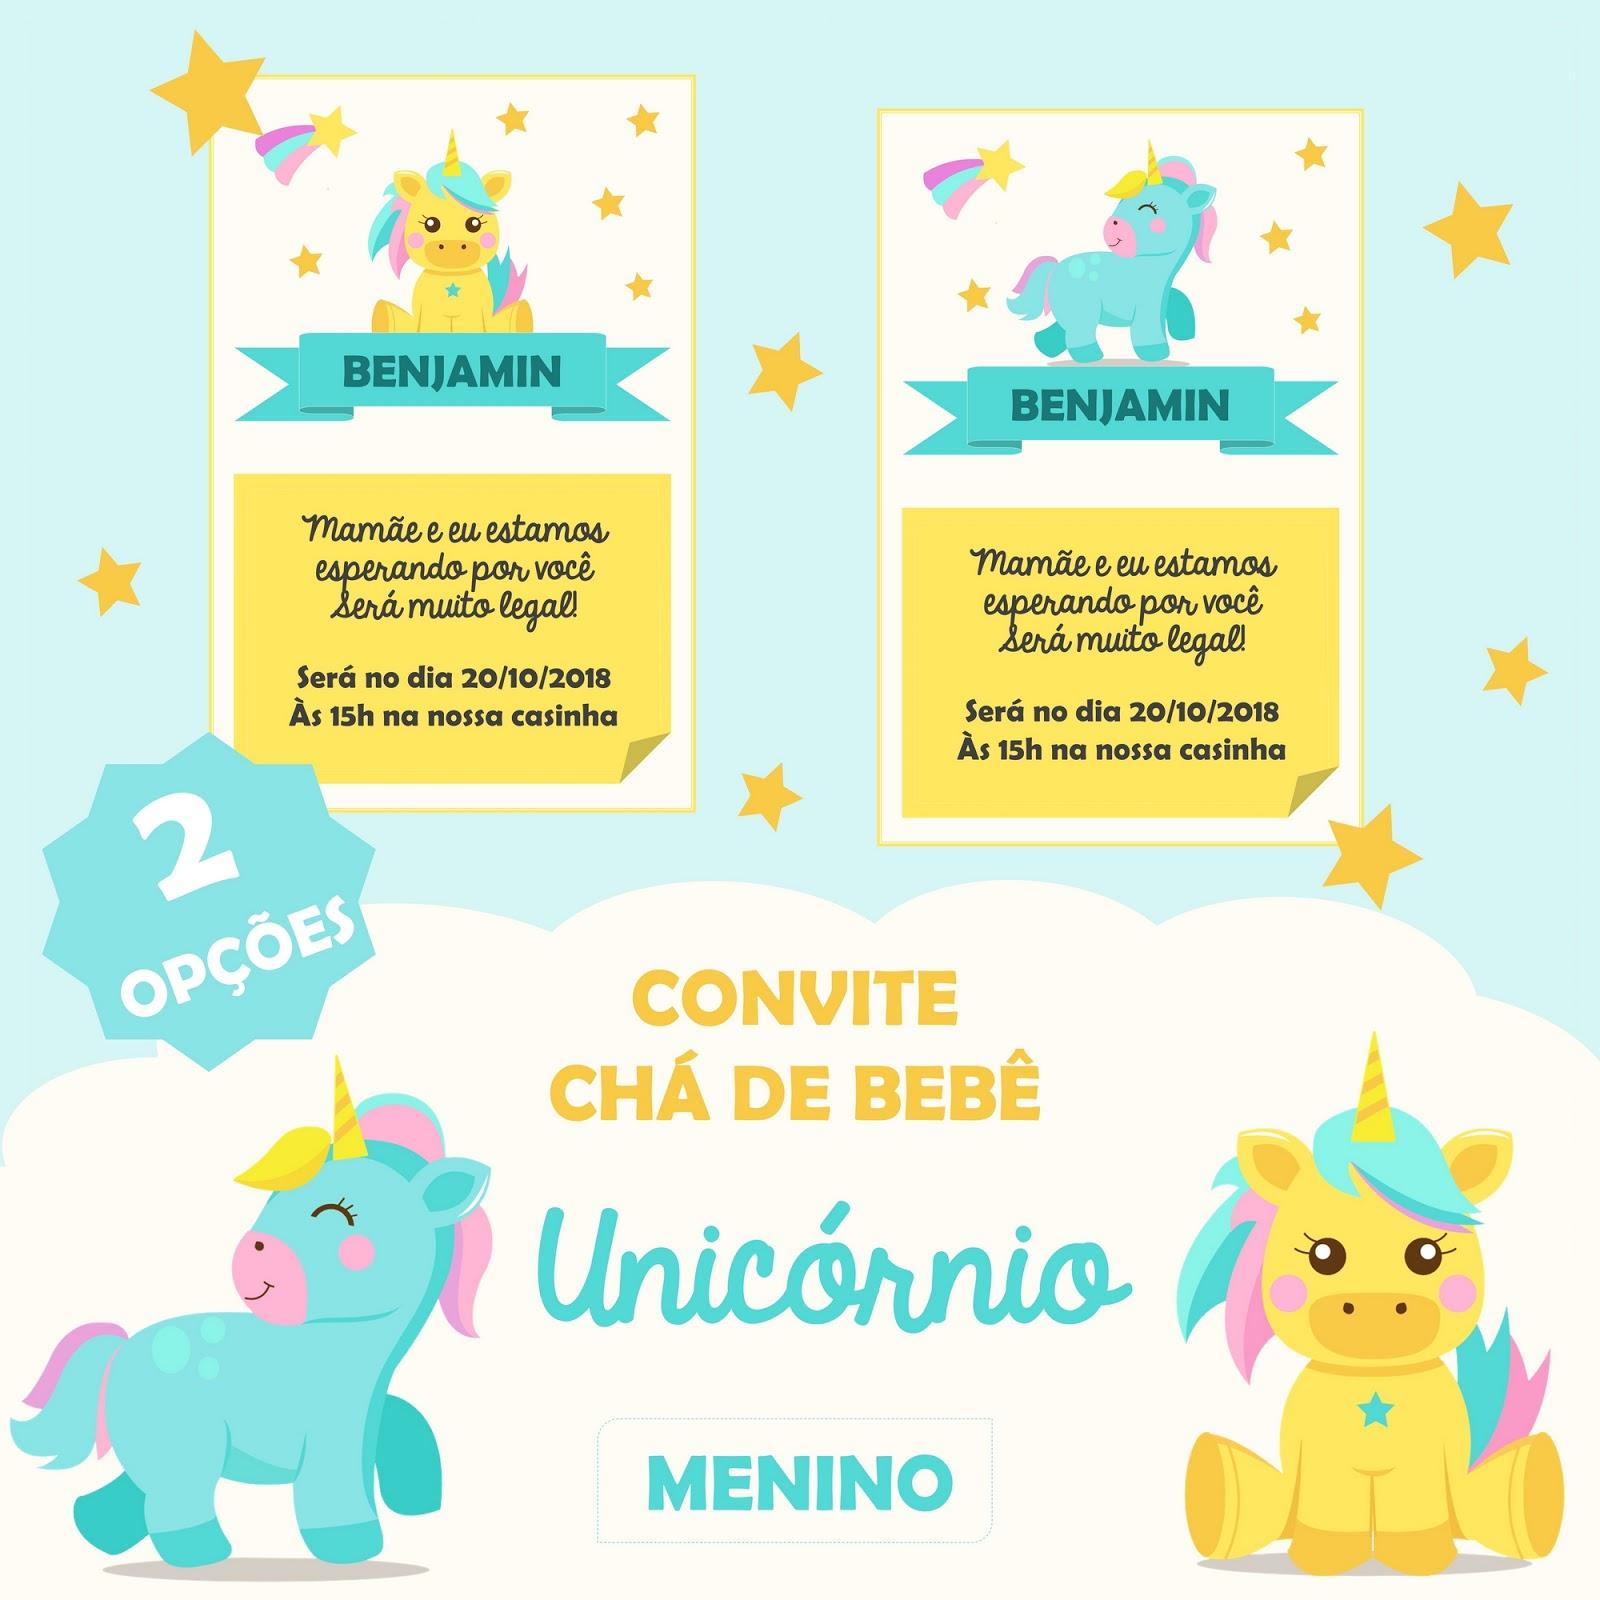 Freebie Convite Chá De Bebê Unicórnio Menino E Menina Editável 4